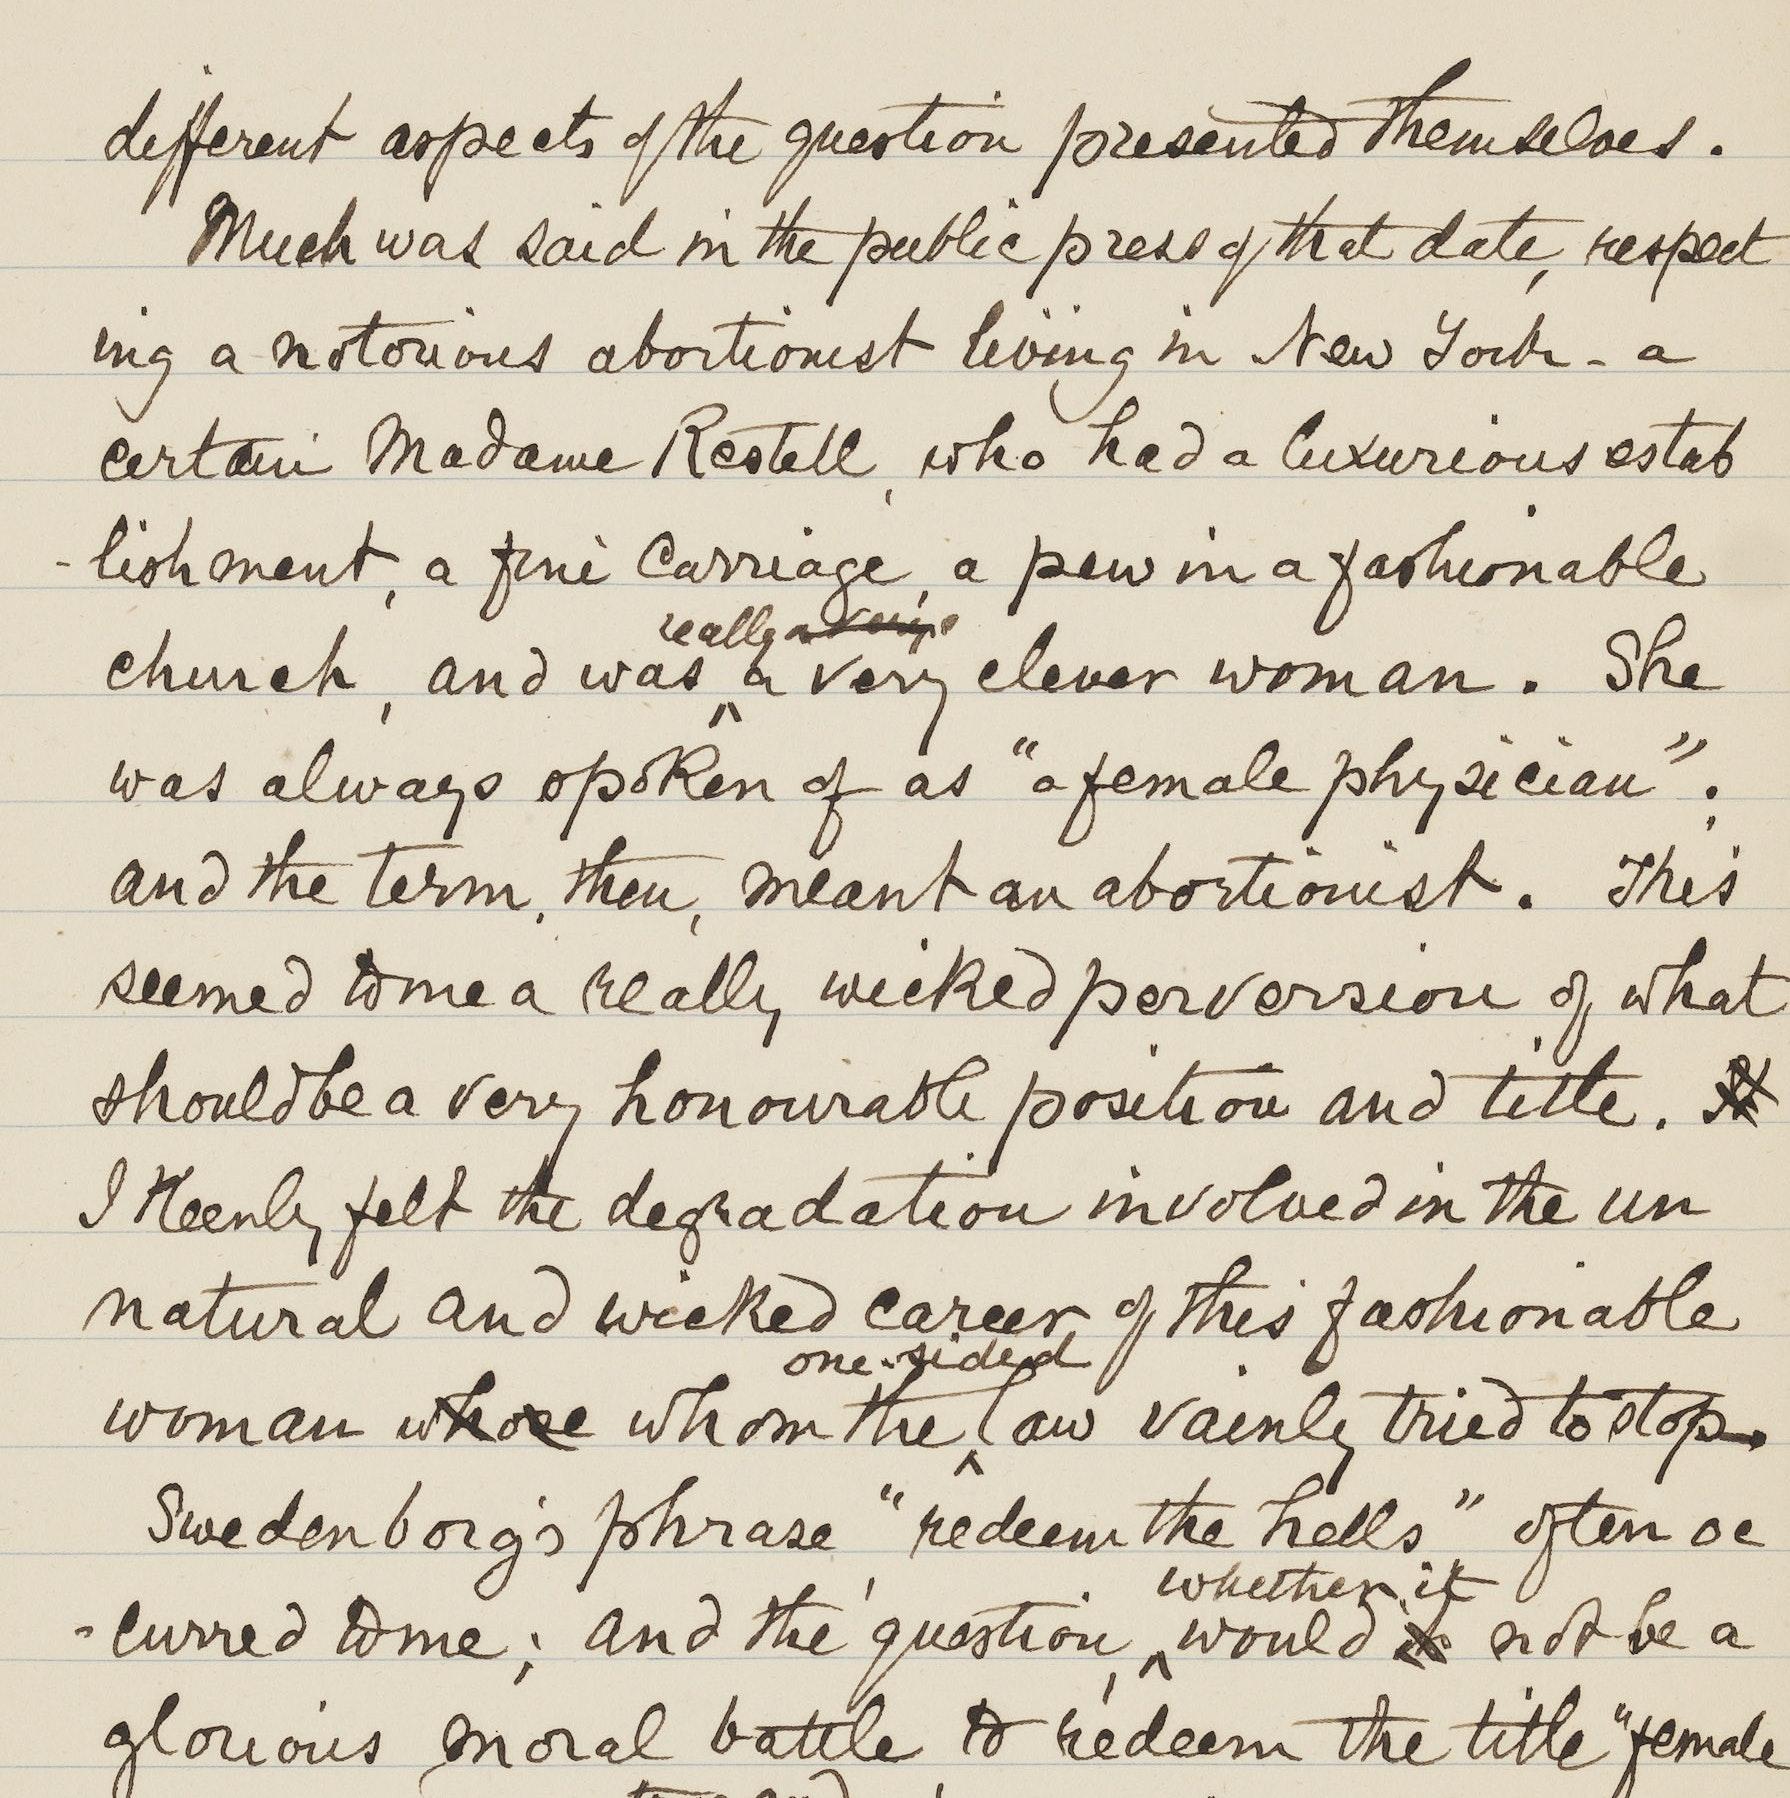 Letter from Elizabeth Blackwell